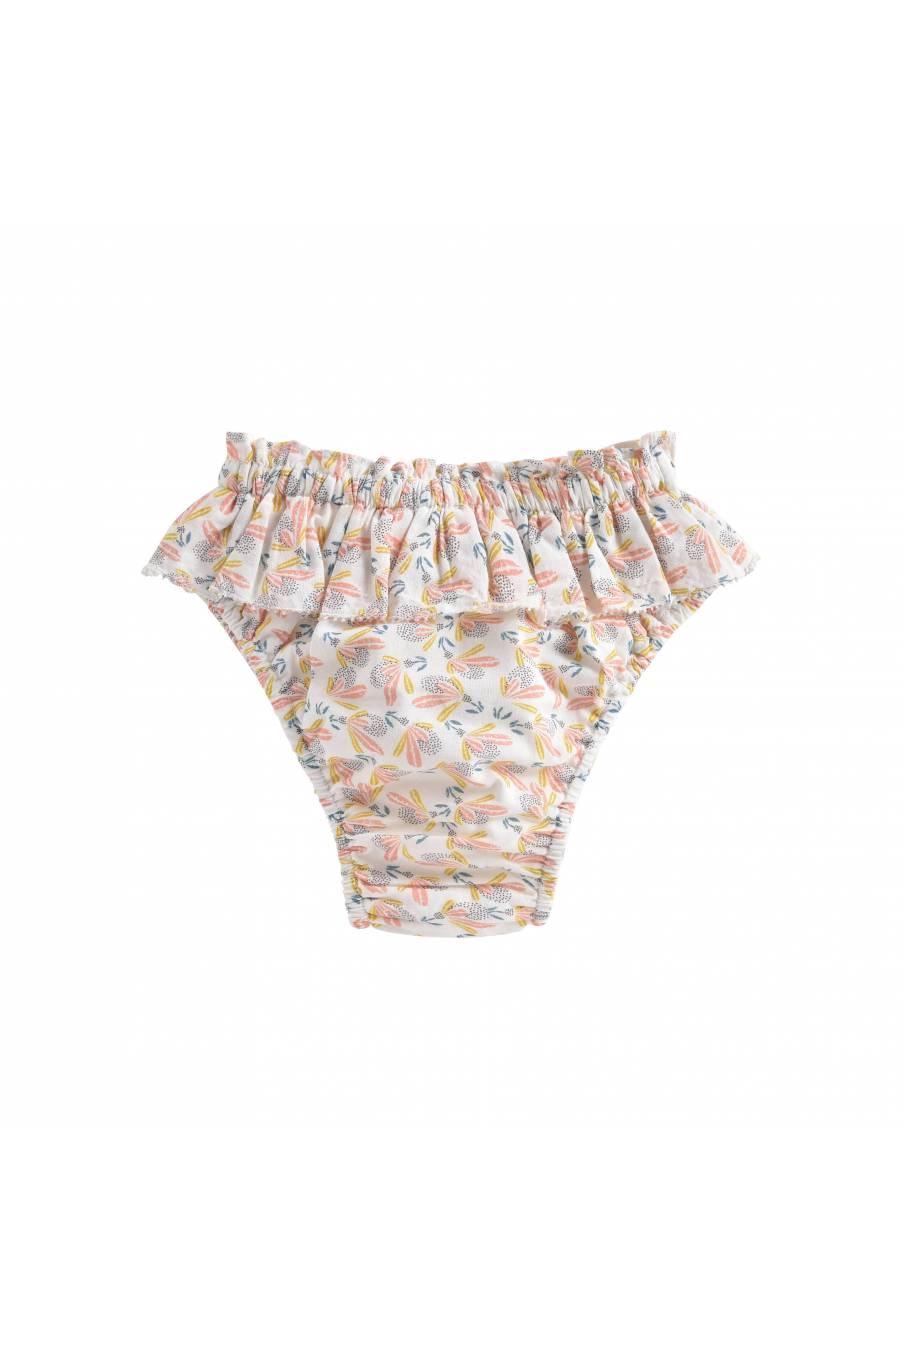 Panties Avi Cream Petals